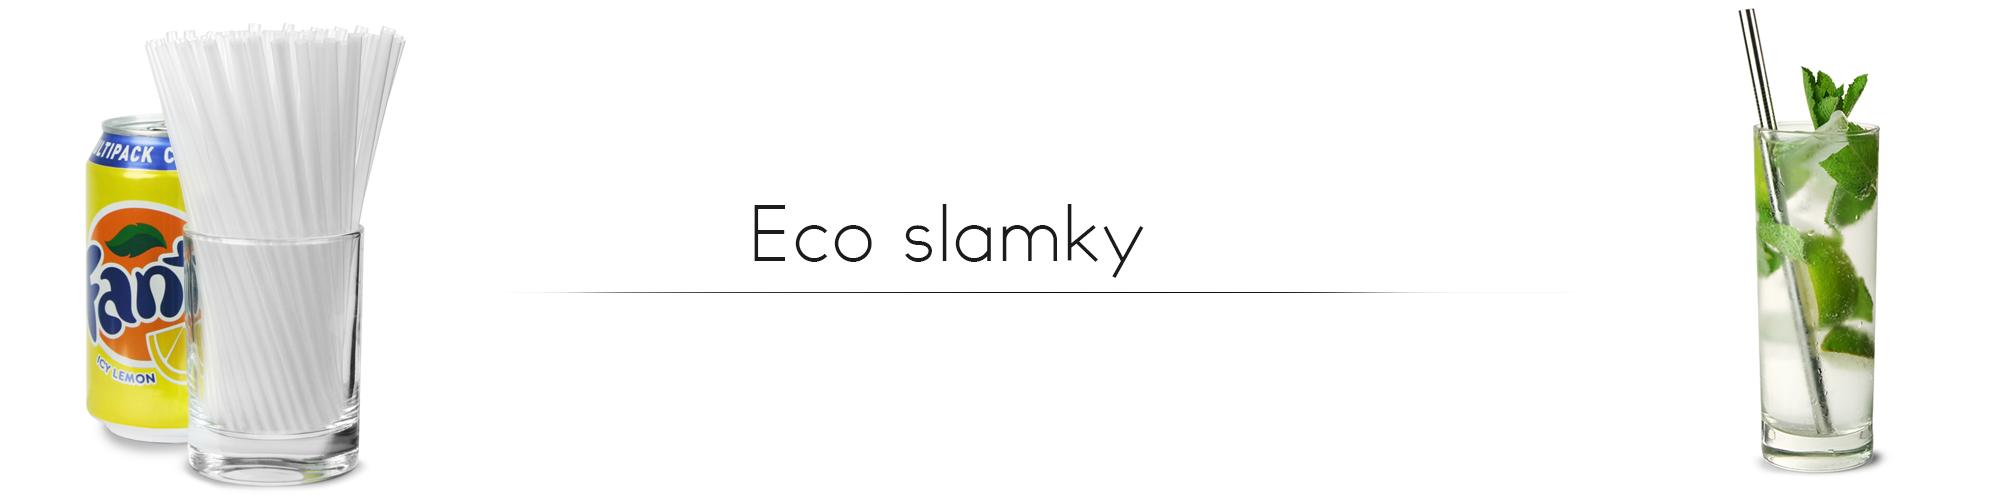 Slamky